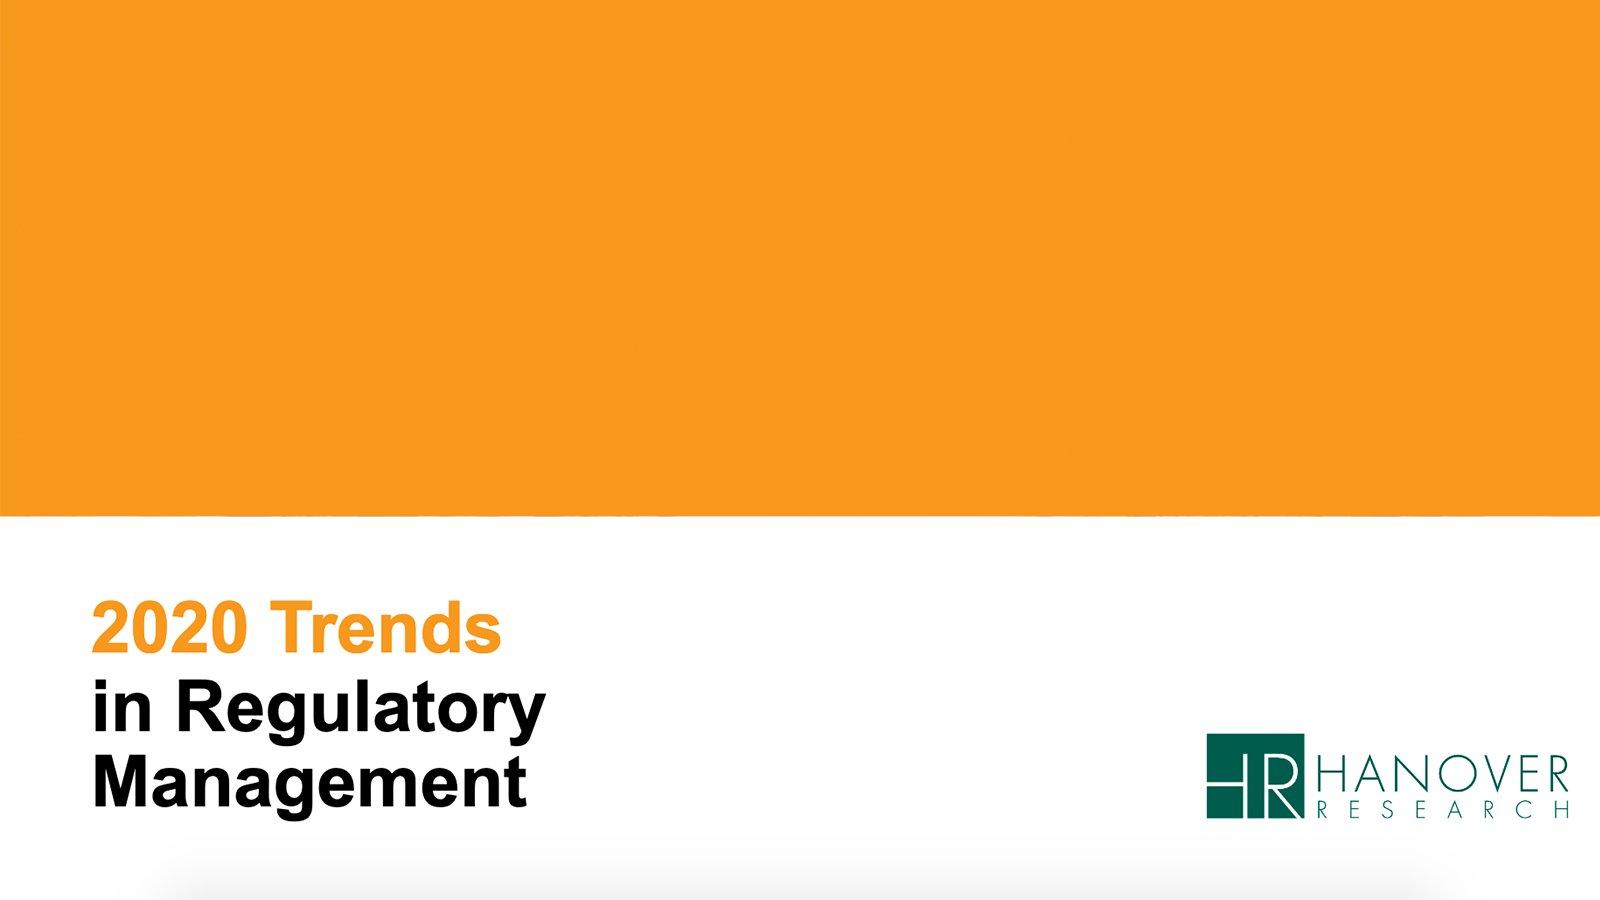 2020 Trends In Regulatory Management